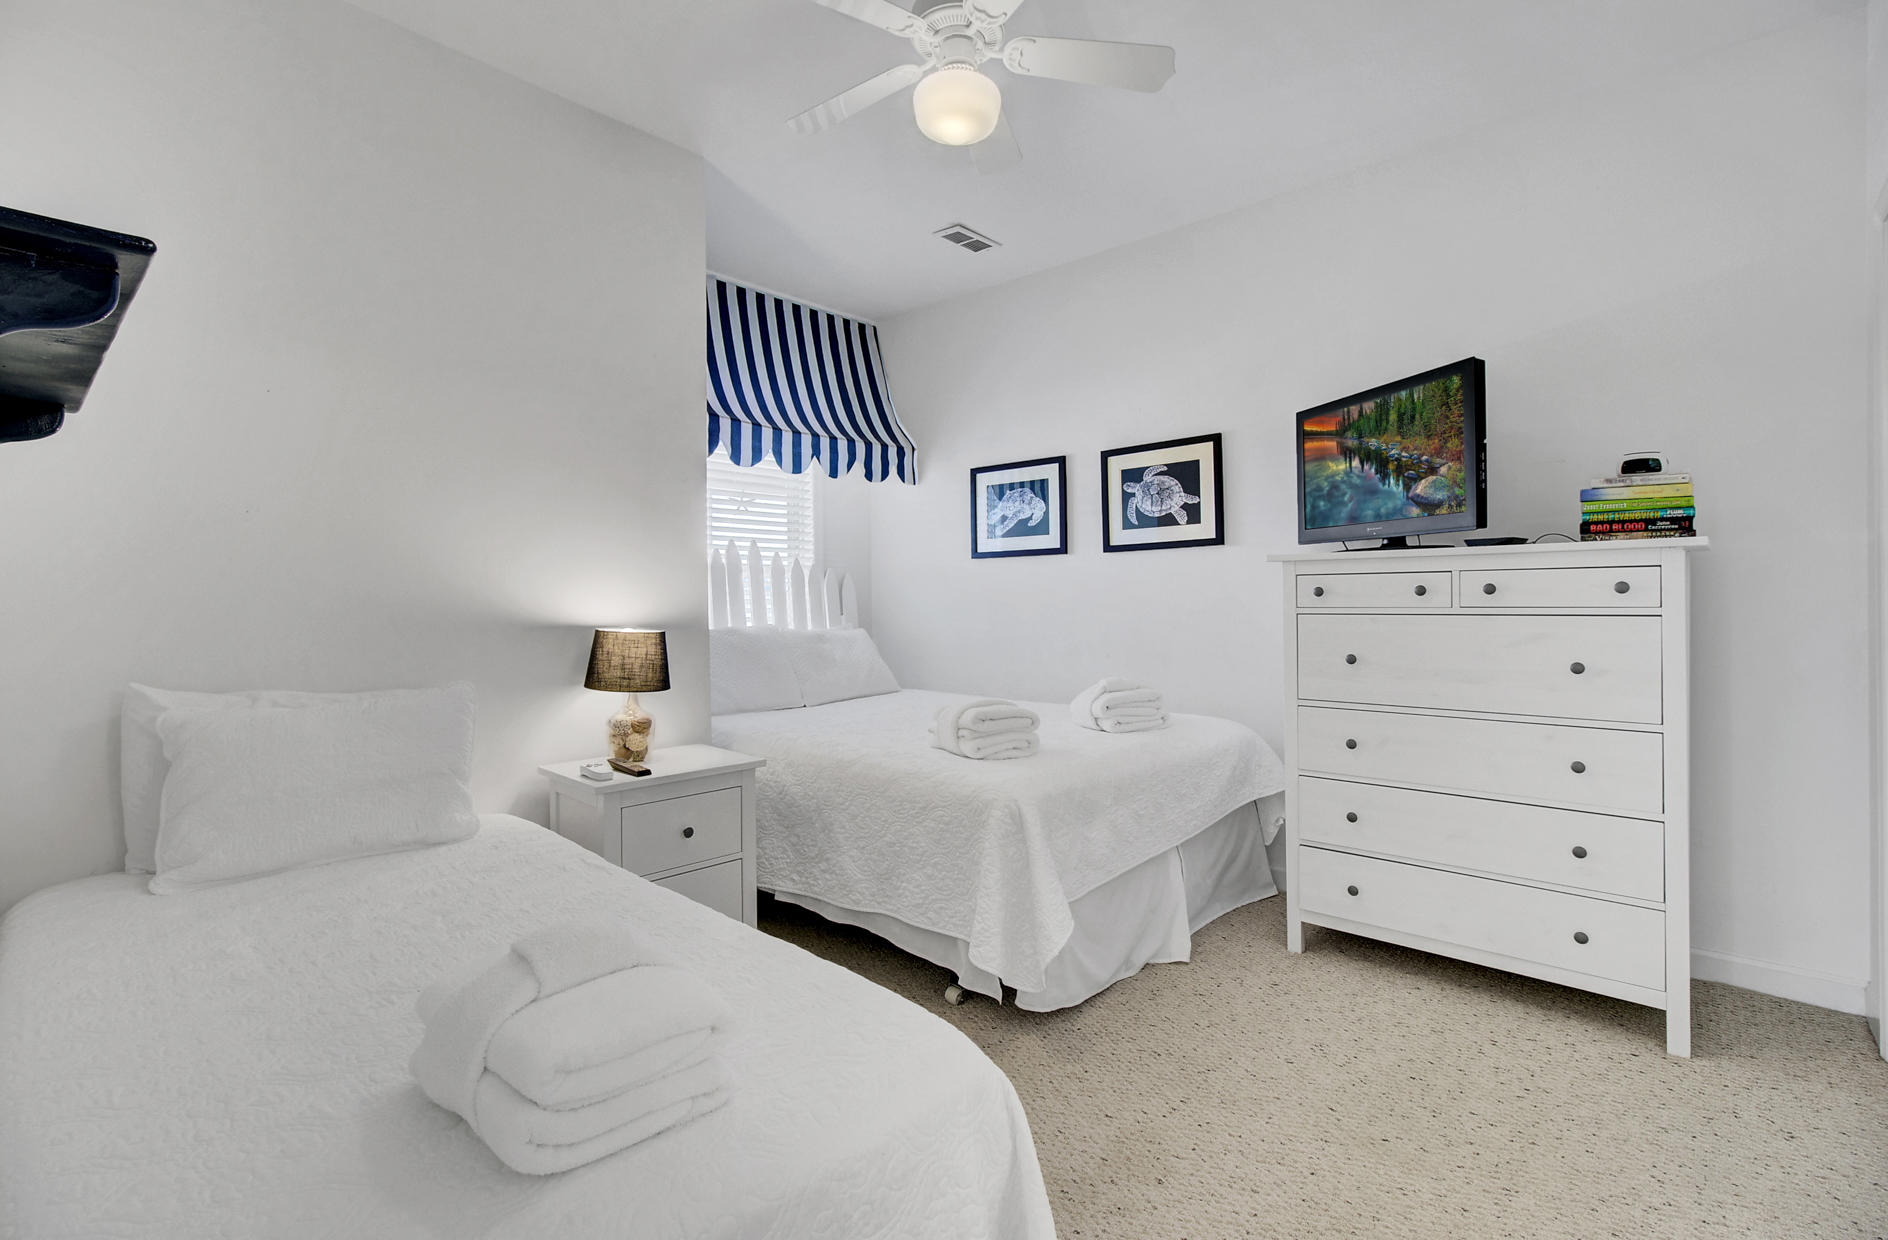 Seaside Villas I Homes For Sale - 111 Arctic, Folly Beach, SC - 19